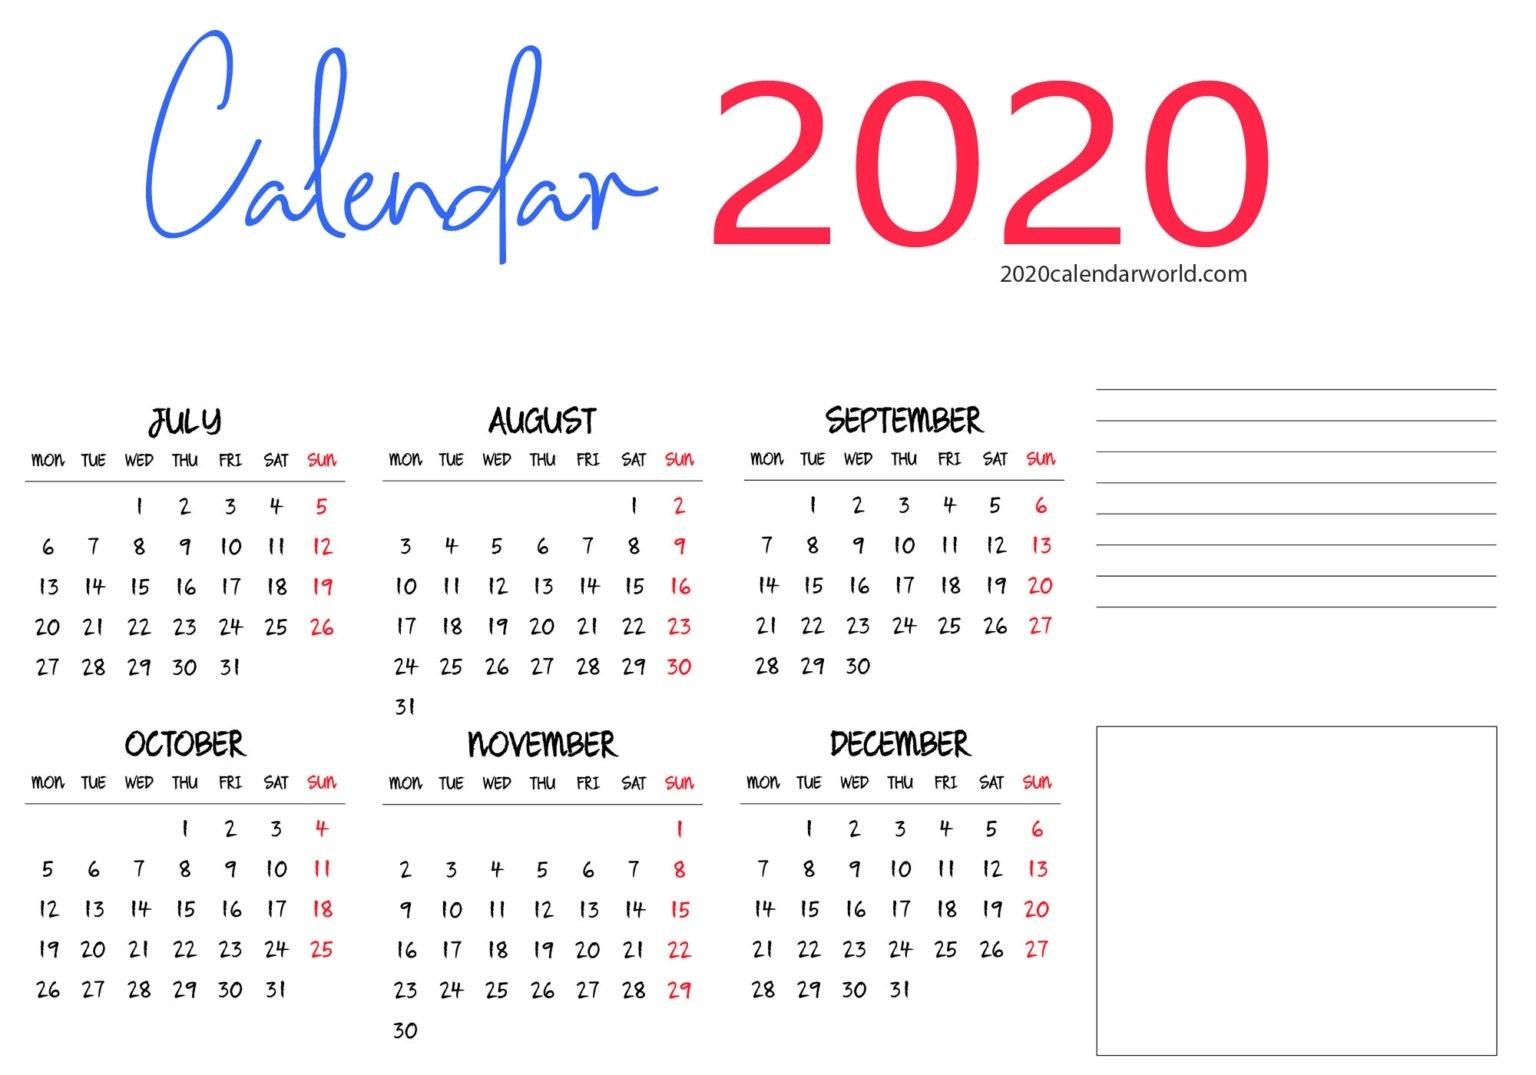 Six Month 2020 Calendar Printable Pdf |Sophiabrown | Medium  Australian 20 20 Six Month Calendars Template